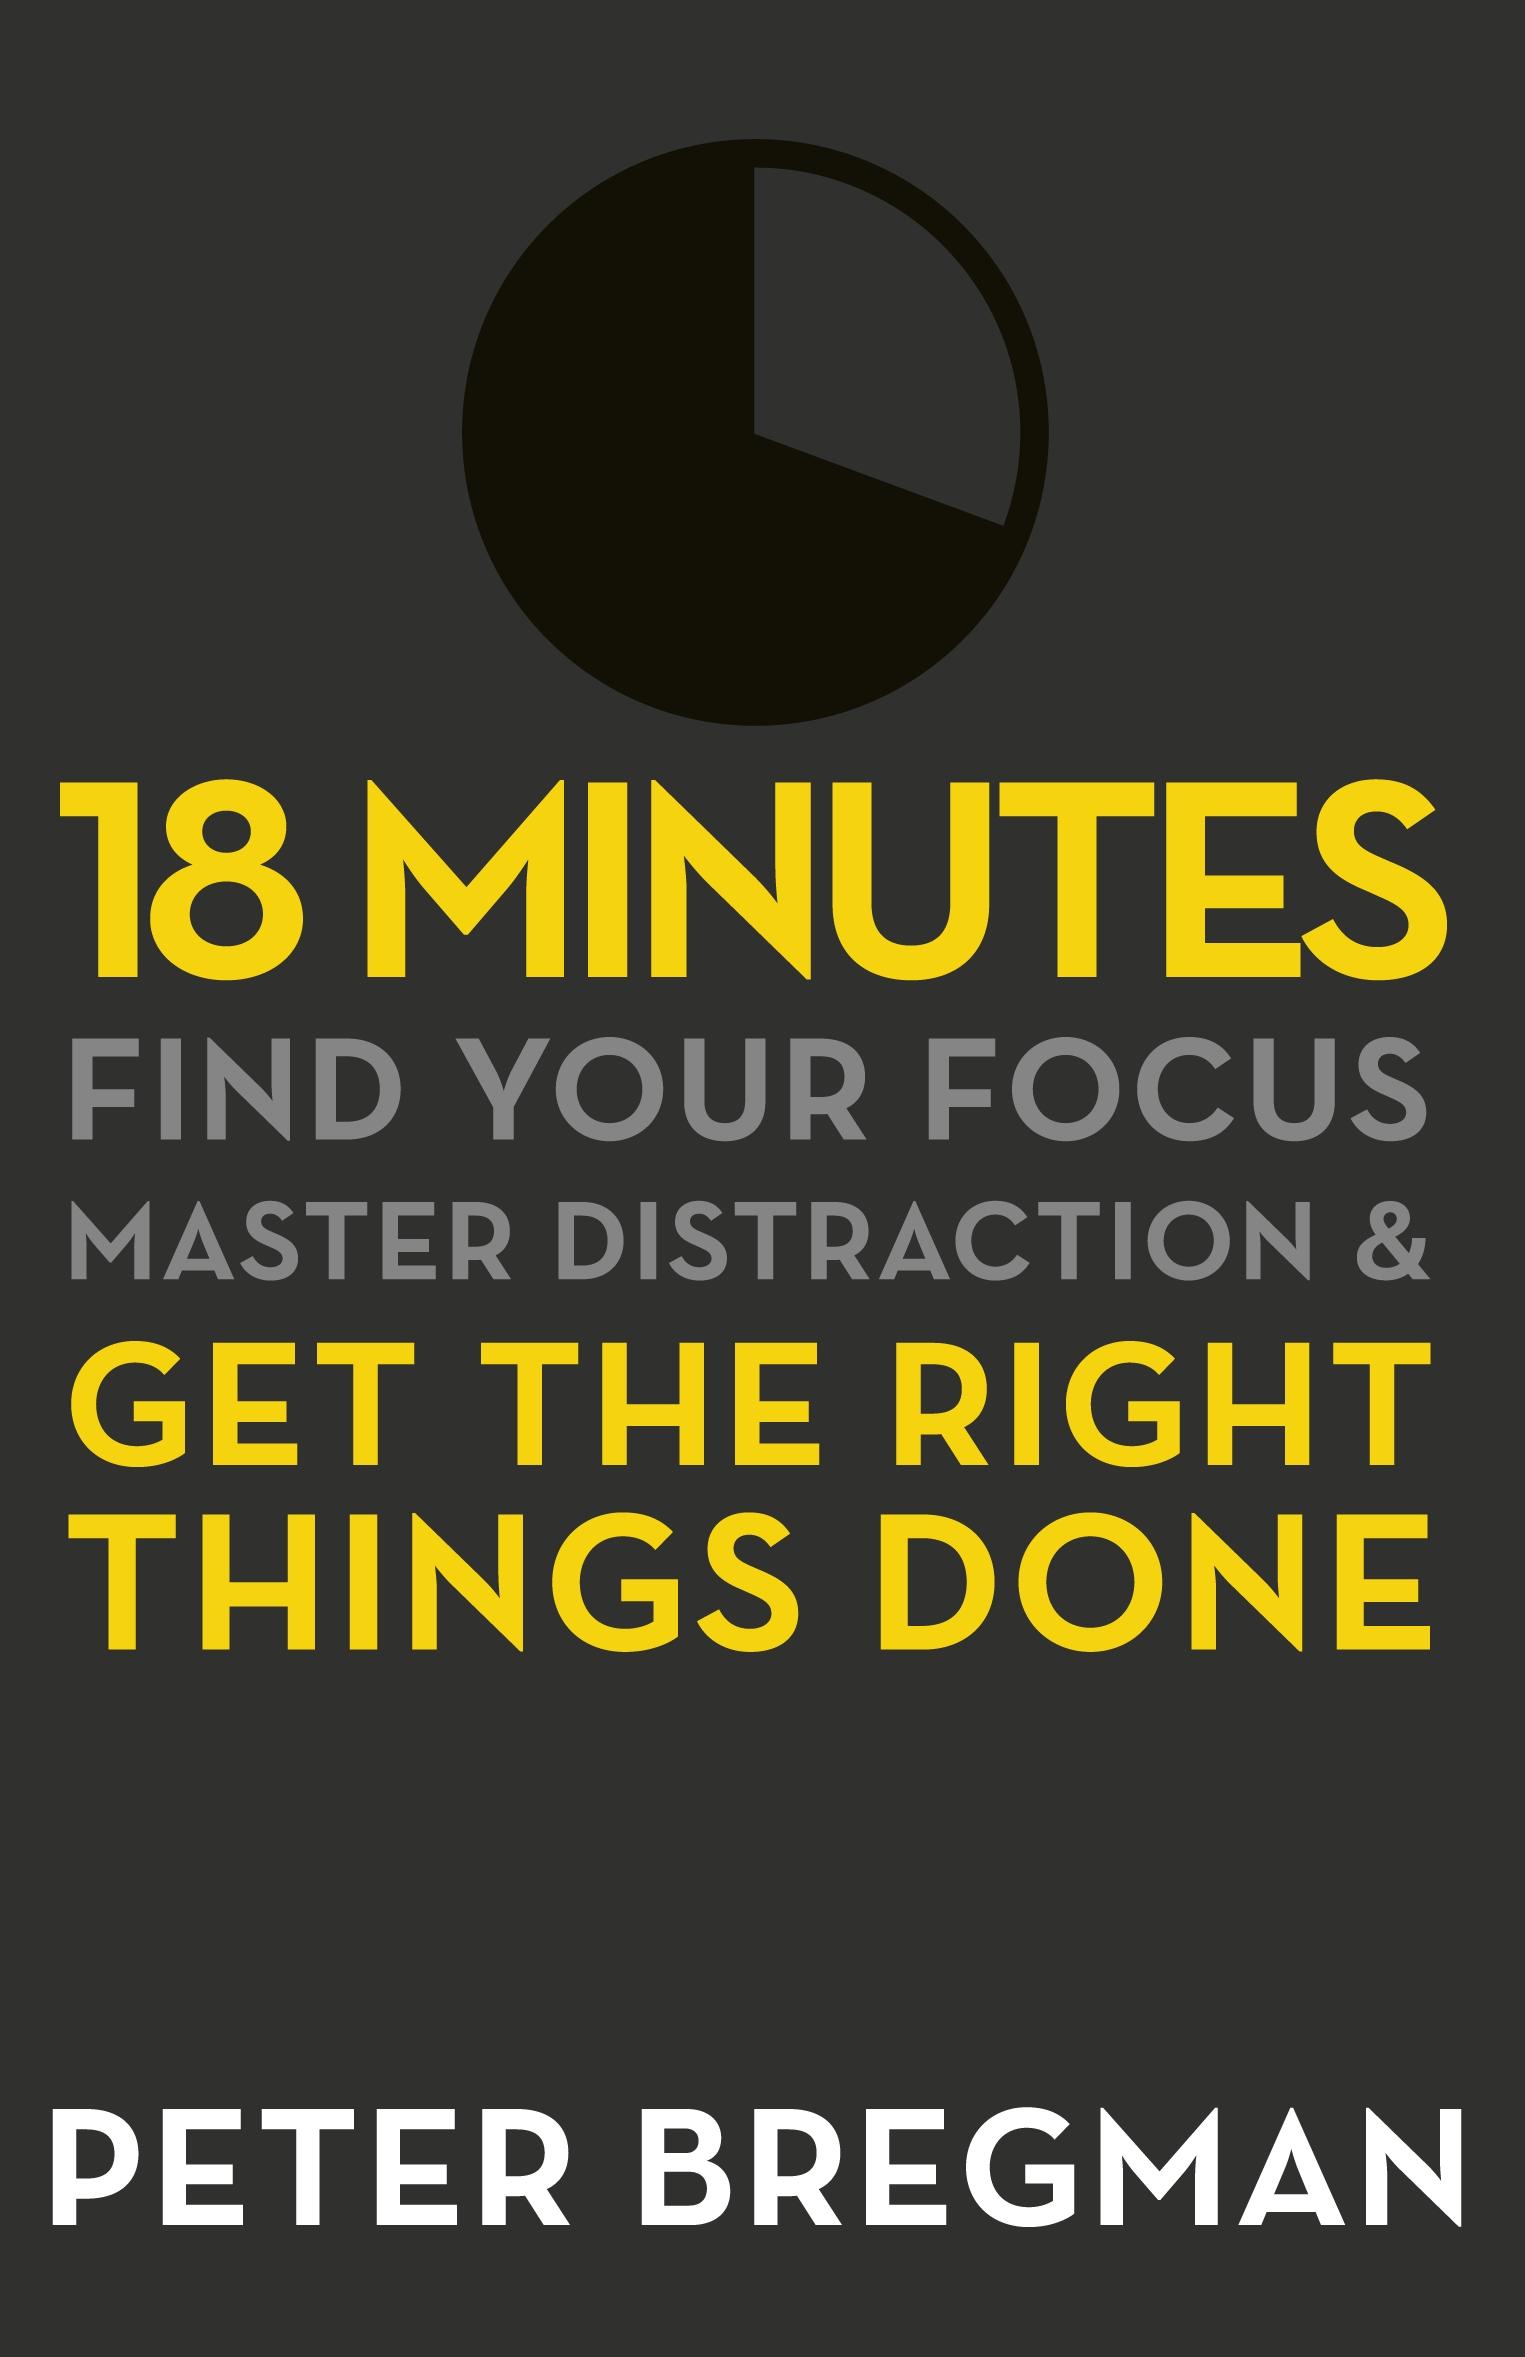 Download Ebook 18 Minutes by Peter Bregman Pdf